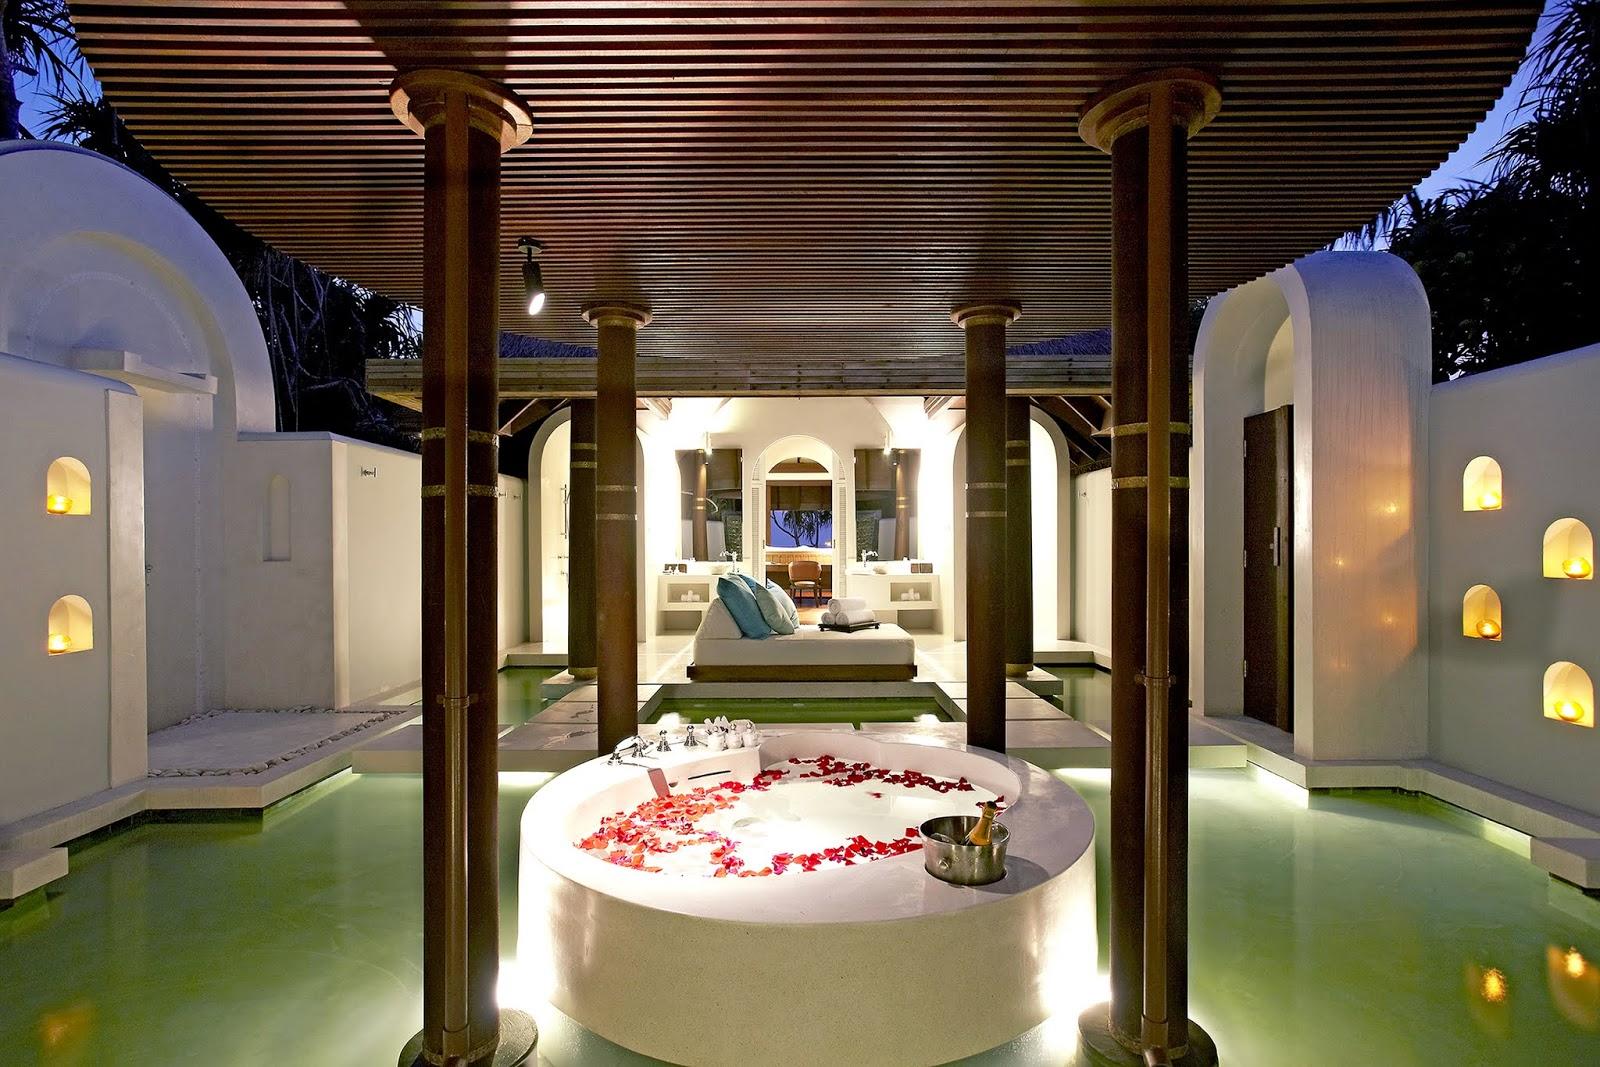 Unique spa offerings